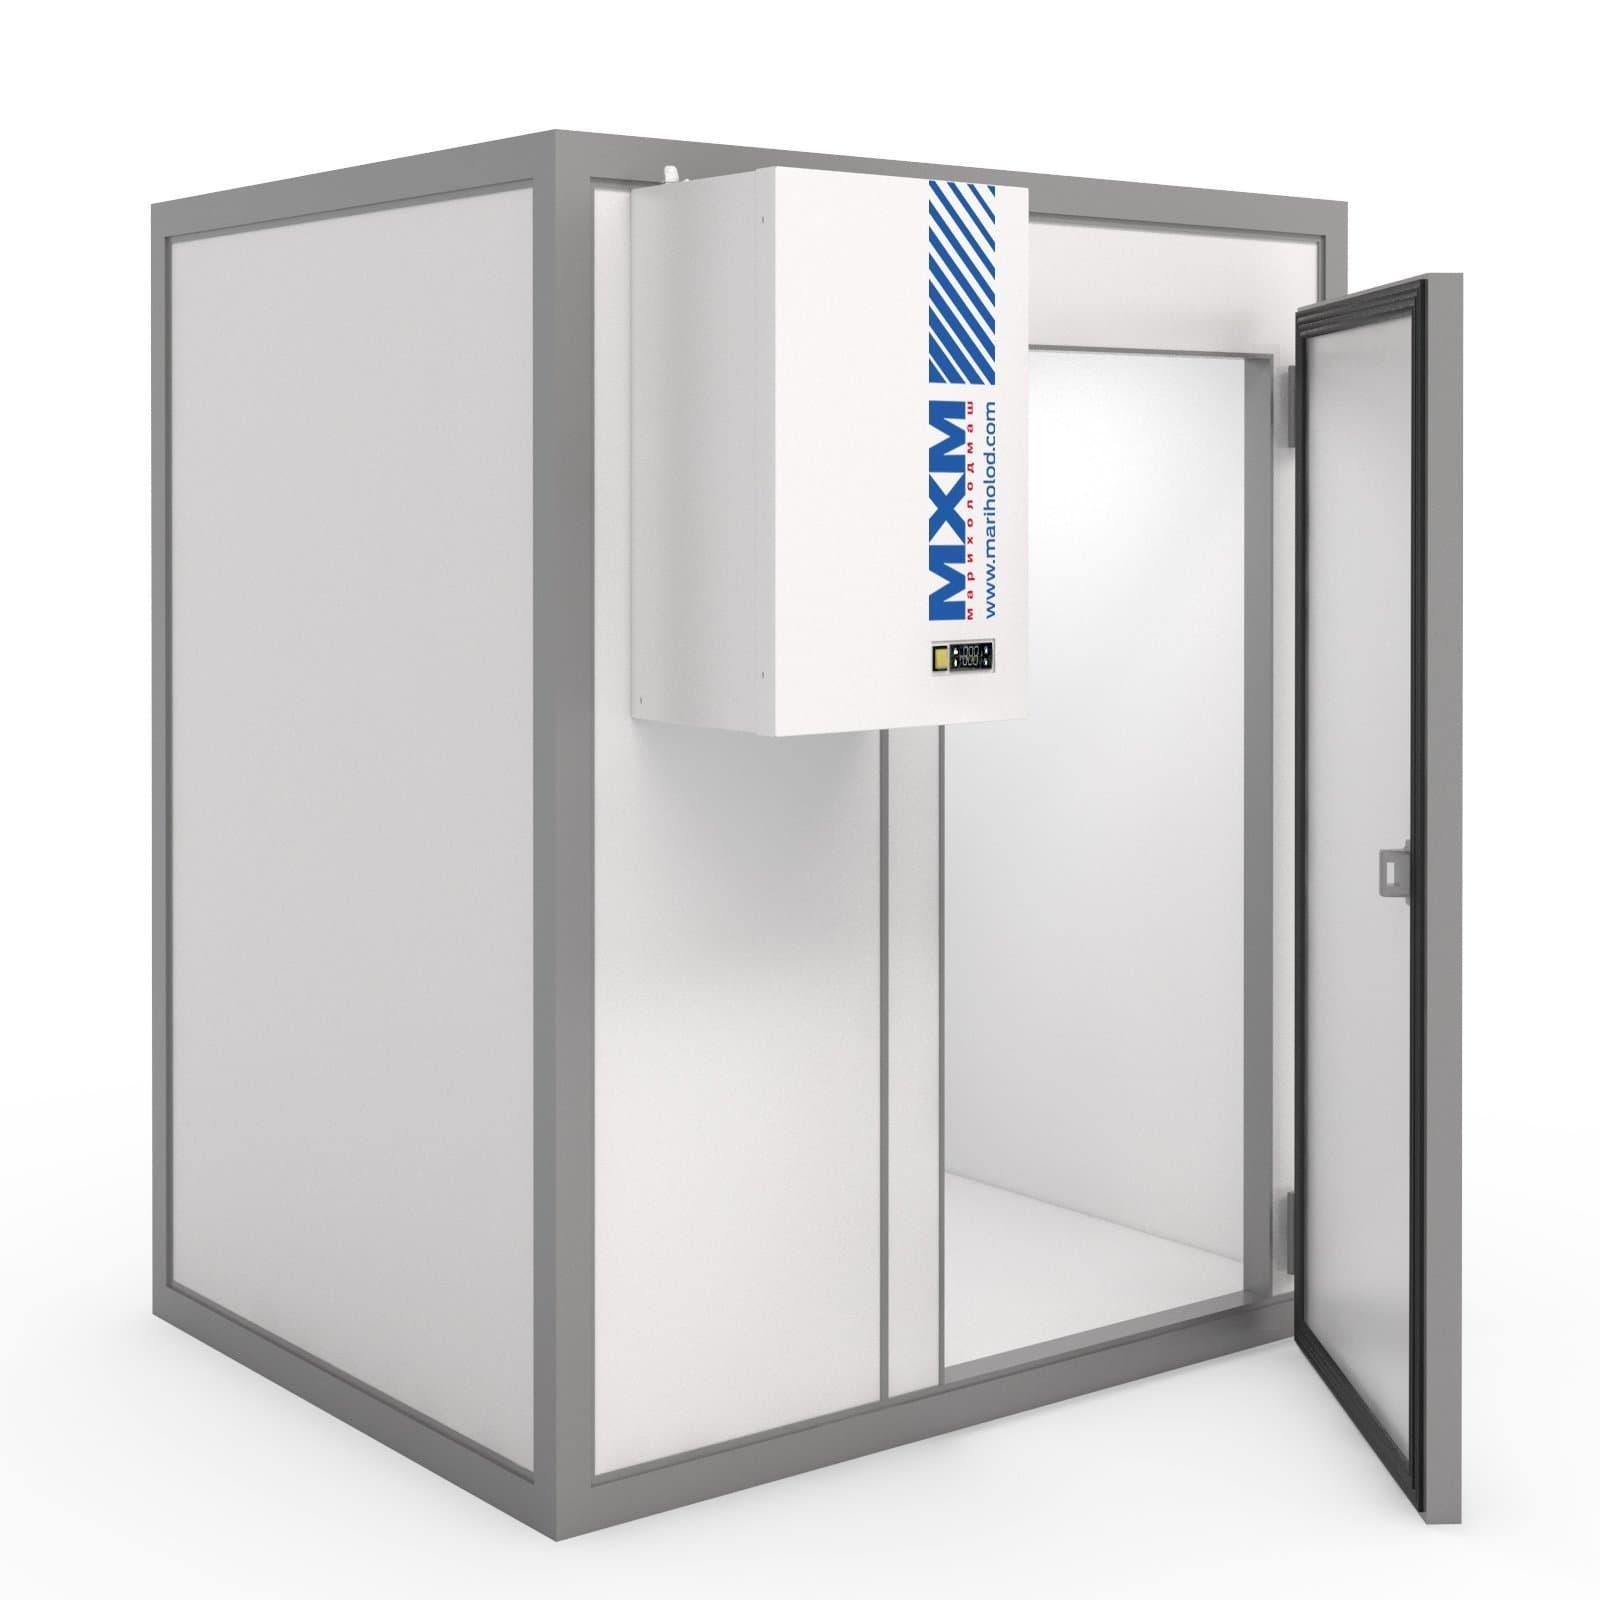 Камера холодильная МХМ КХН-13,04 2260×2860×2460